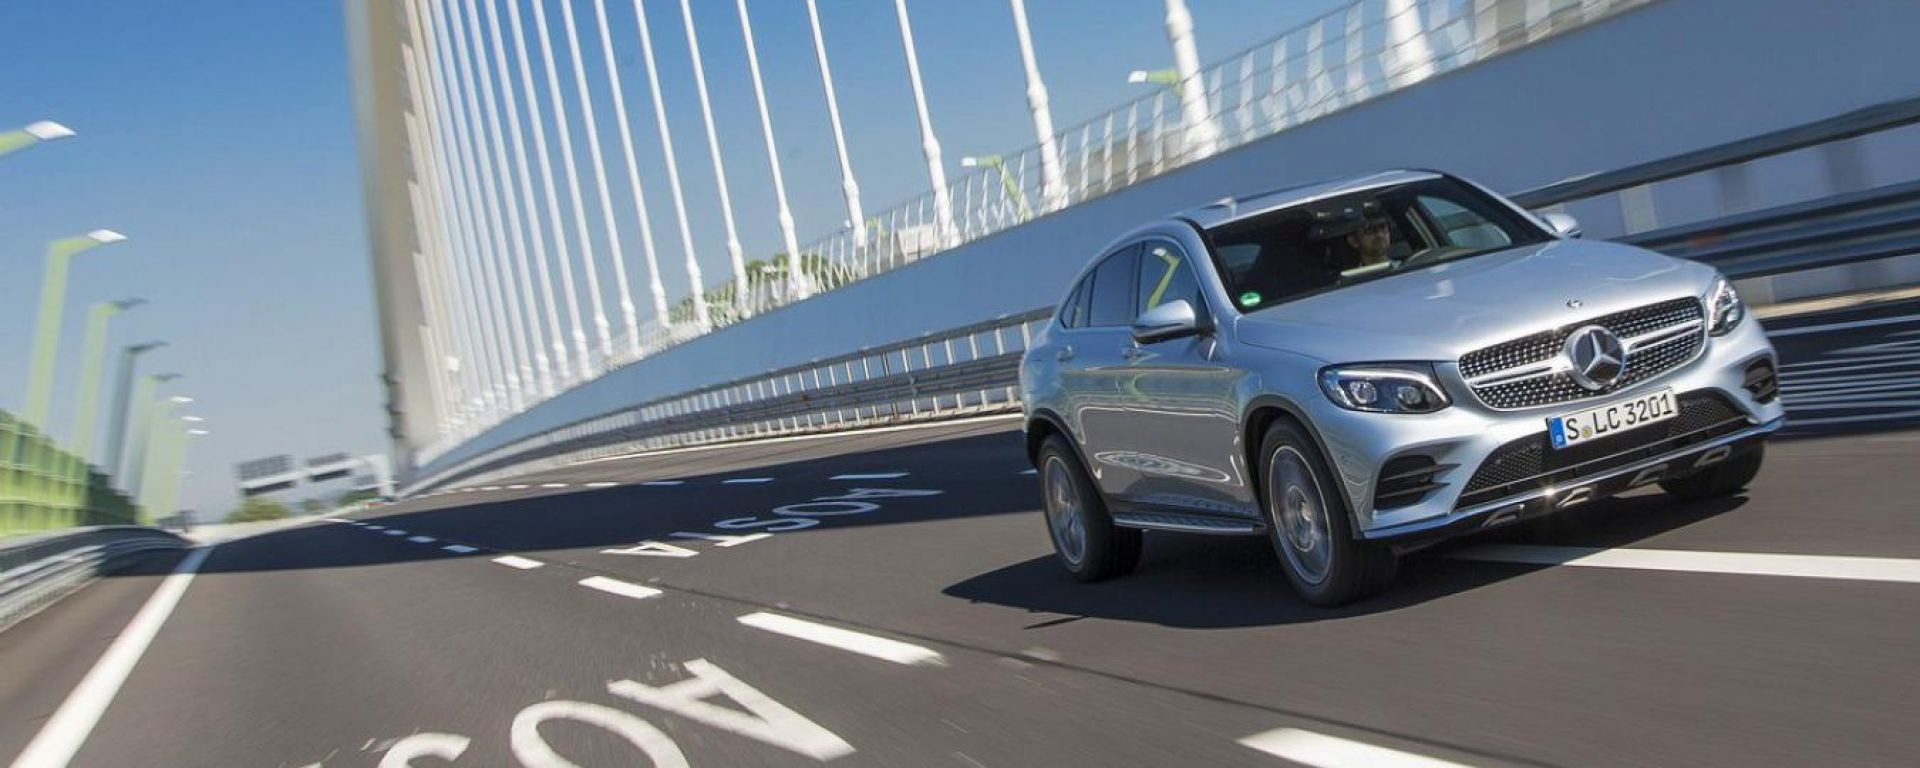 Mercedes, altre grane dieselgate